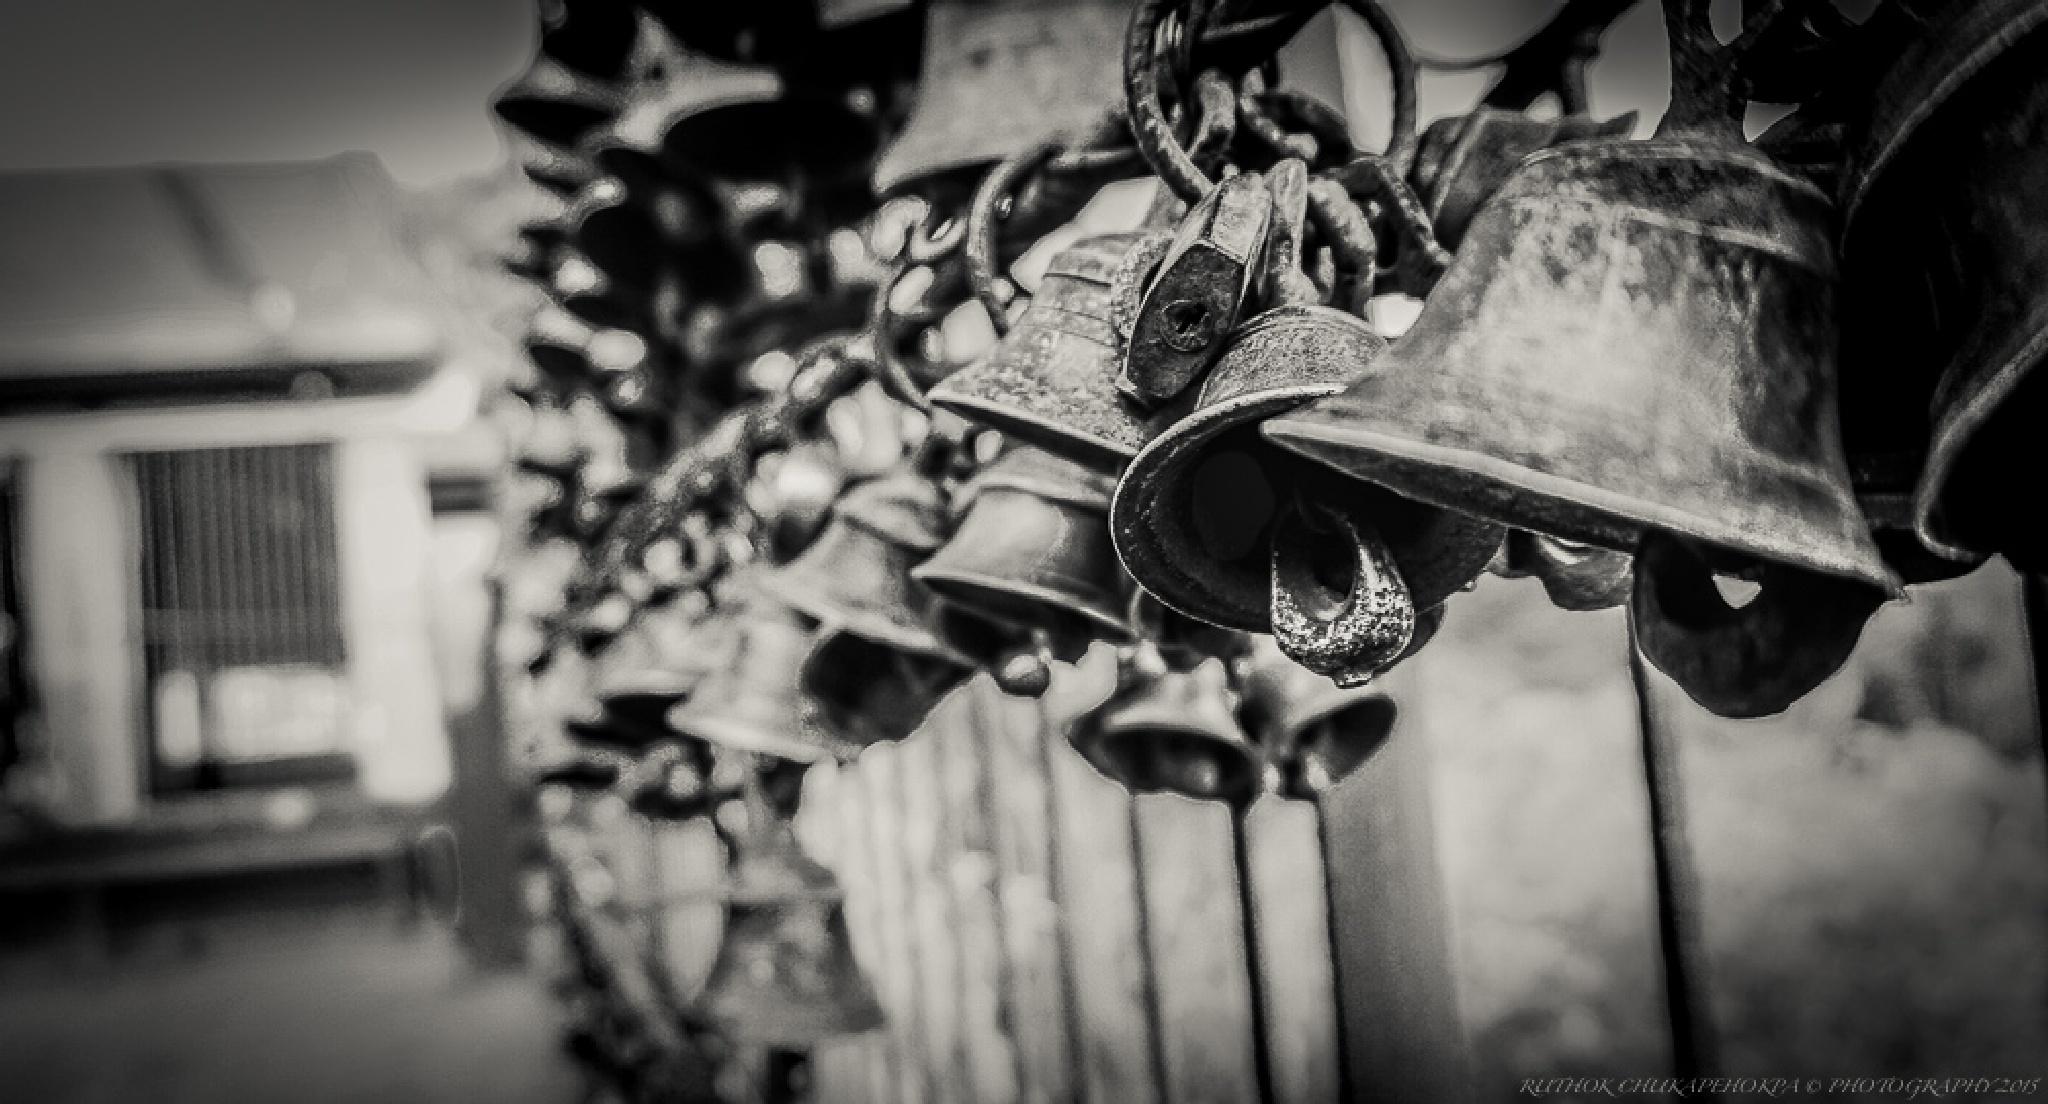 To whom the bell tolls by Ruthok Chukapehokpa